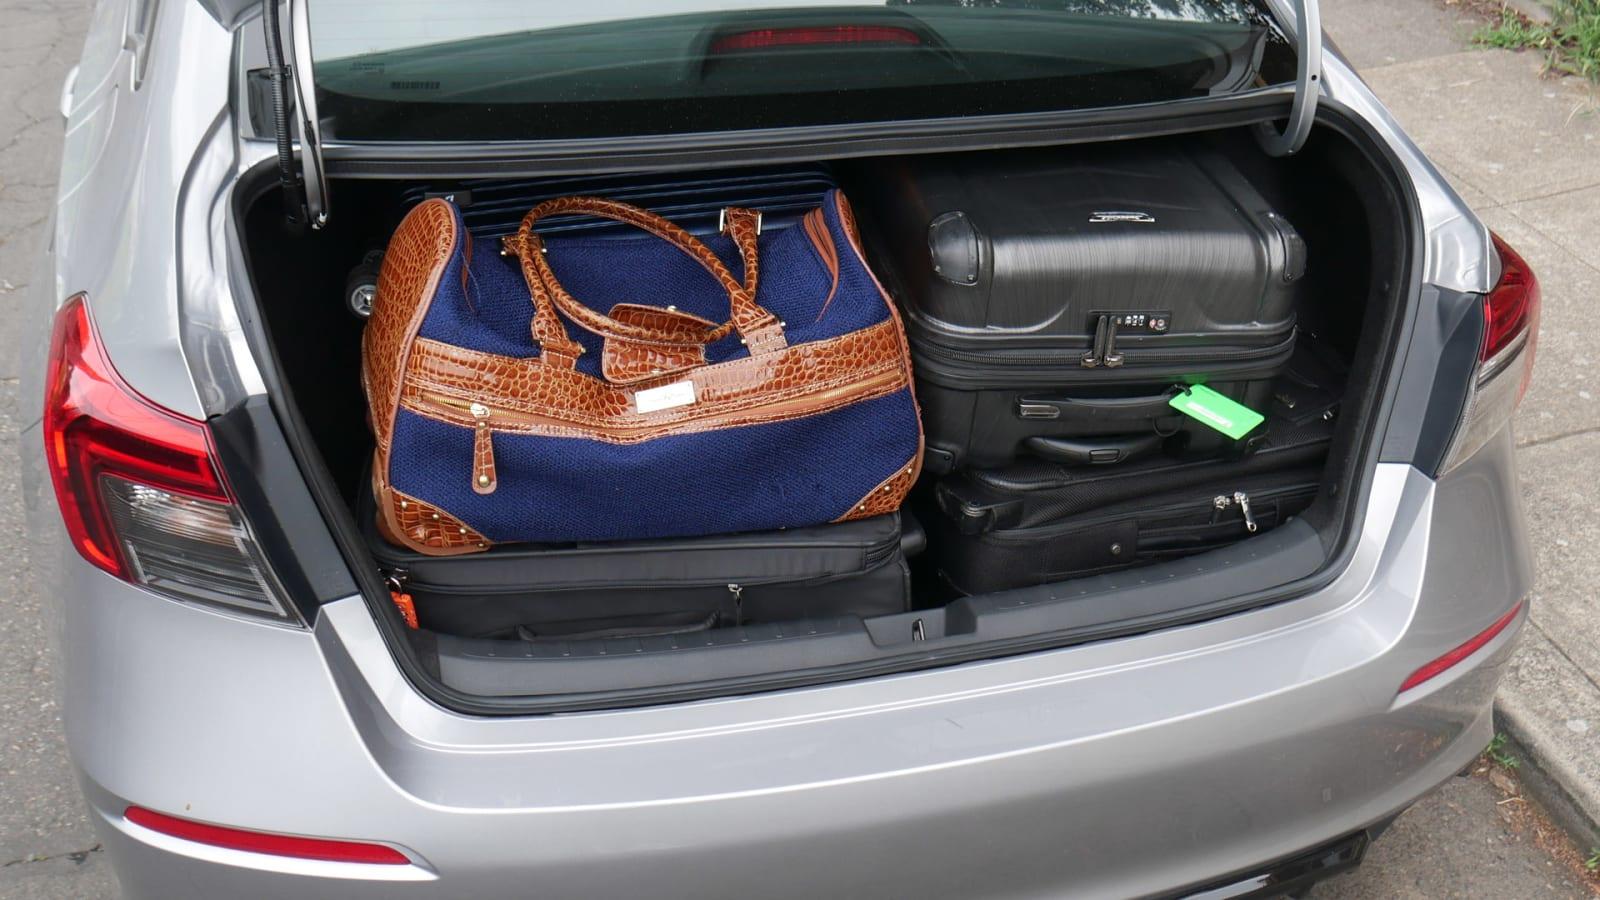 2022 Honda Civic Luggage Test all bags